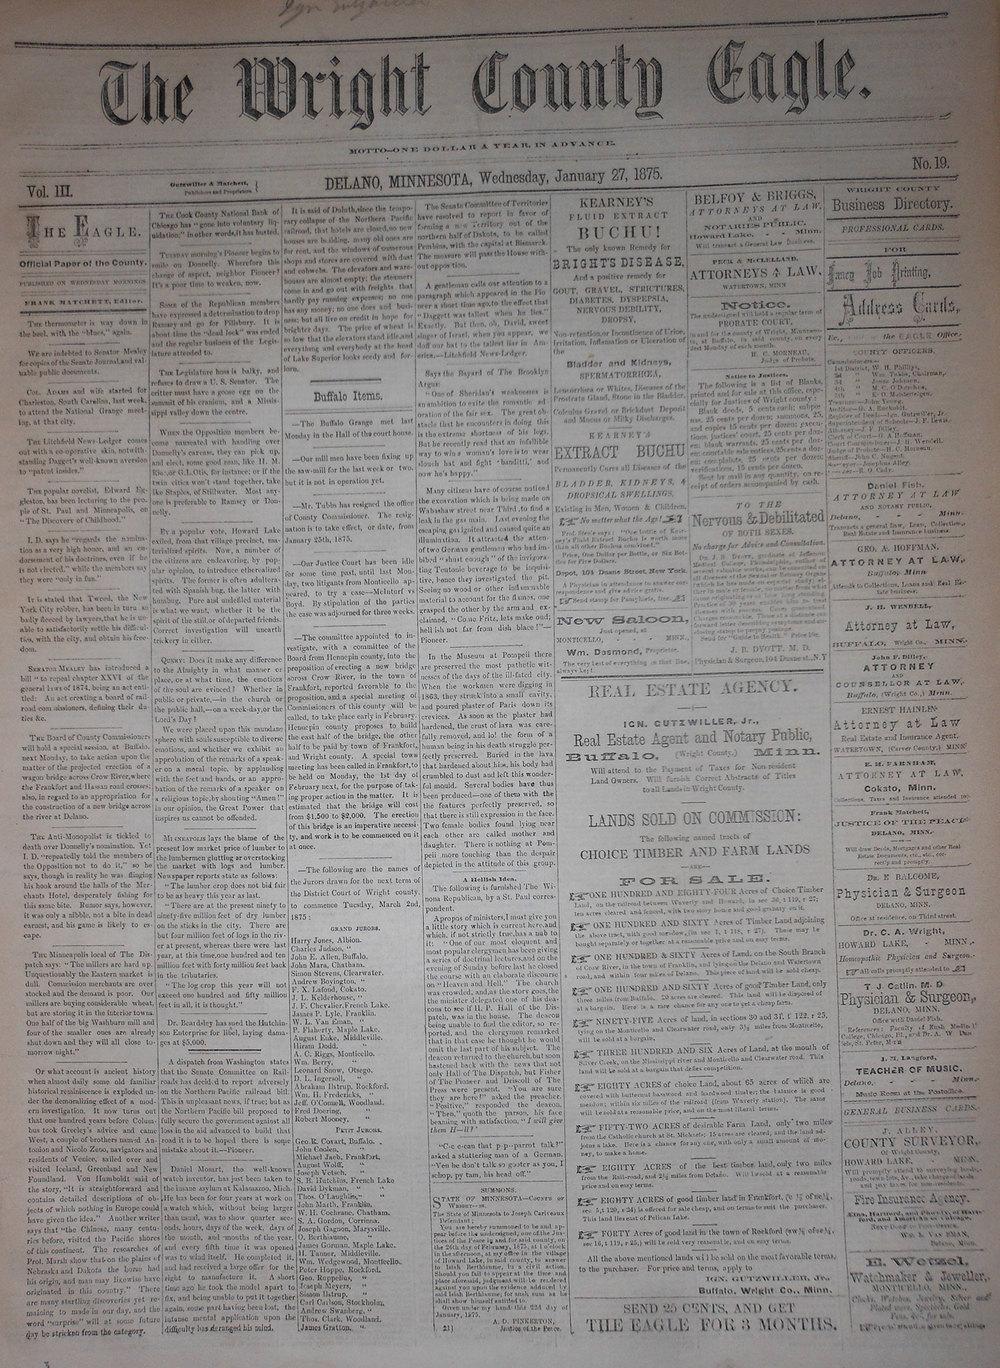 1/27/1875, p1